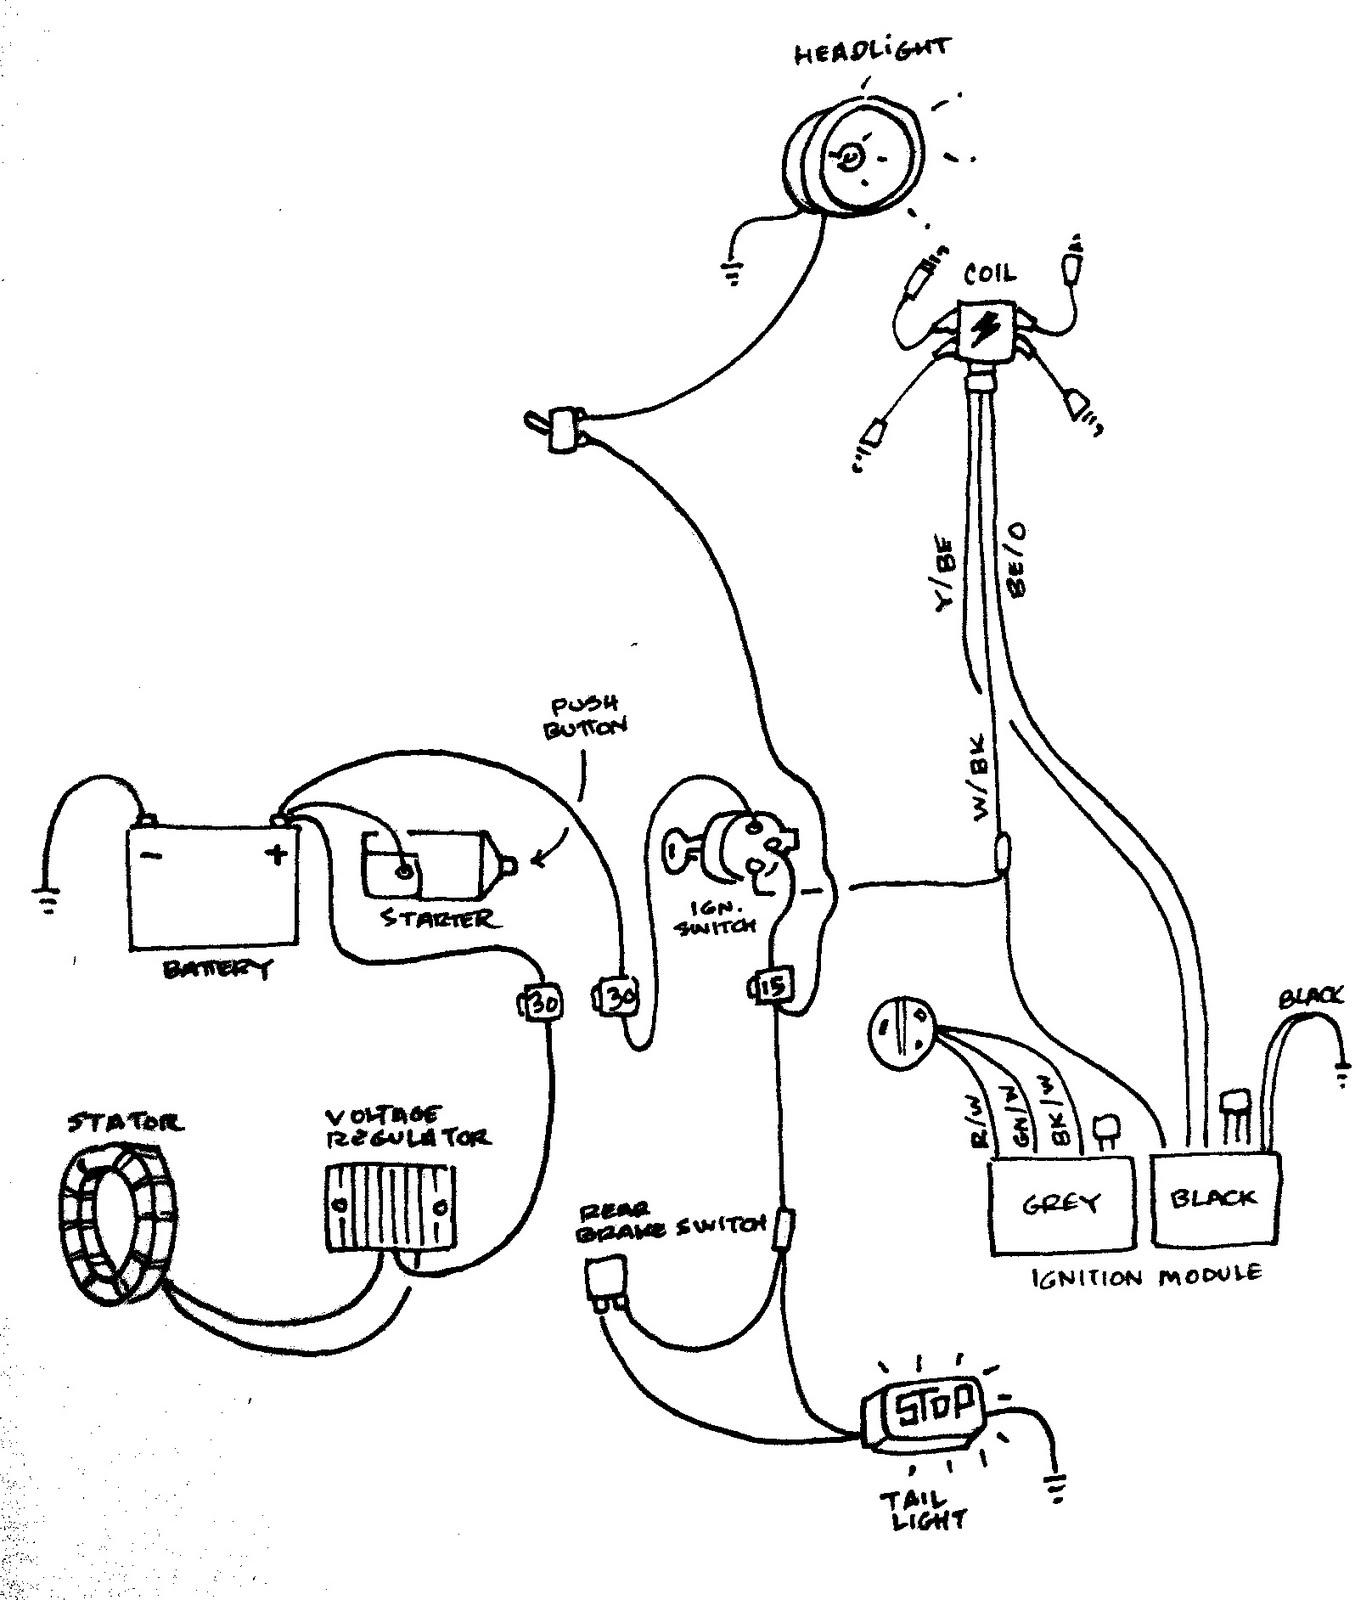 Gio 50cc Quad Wiring Diagram as well Thread Aprikia Wiring Diagrams Manuals likewise Tao Tao 110 Wiring Diagram in addition Kazuma Raptor 50cc Atv Wiring Diagram besides 328798 Starter Button Not Working Solenoid Shorting Does. on kazuma 110 wiring diagram